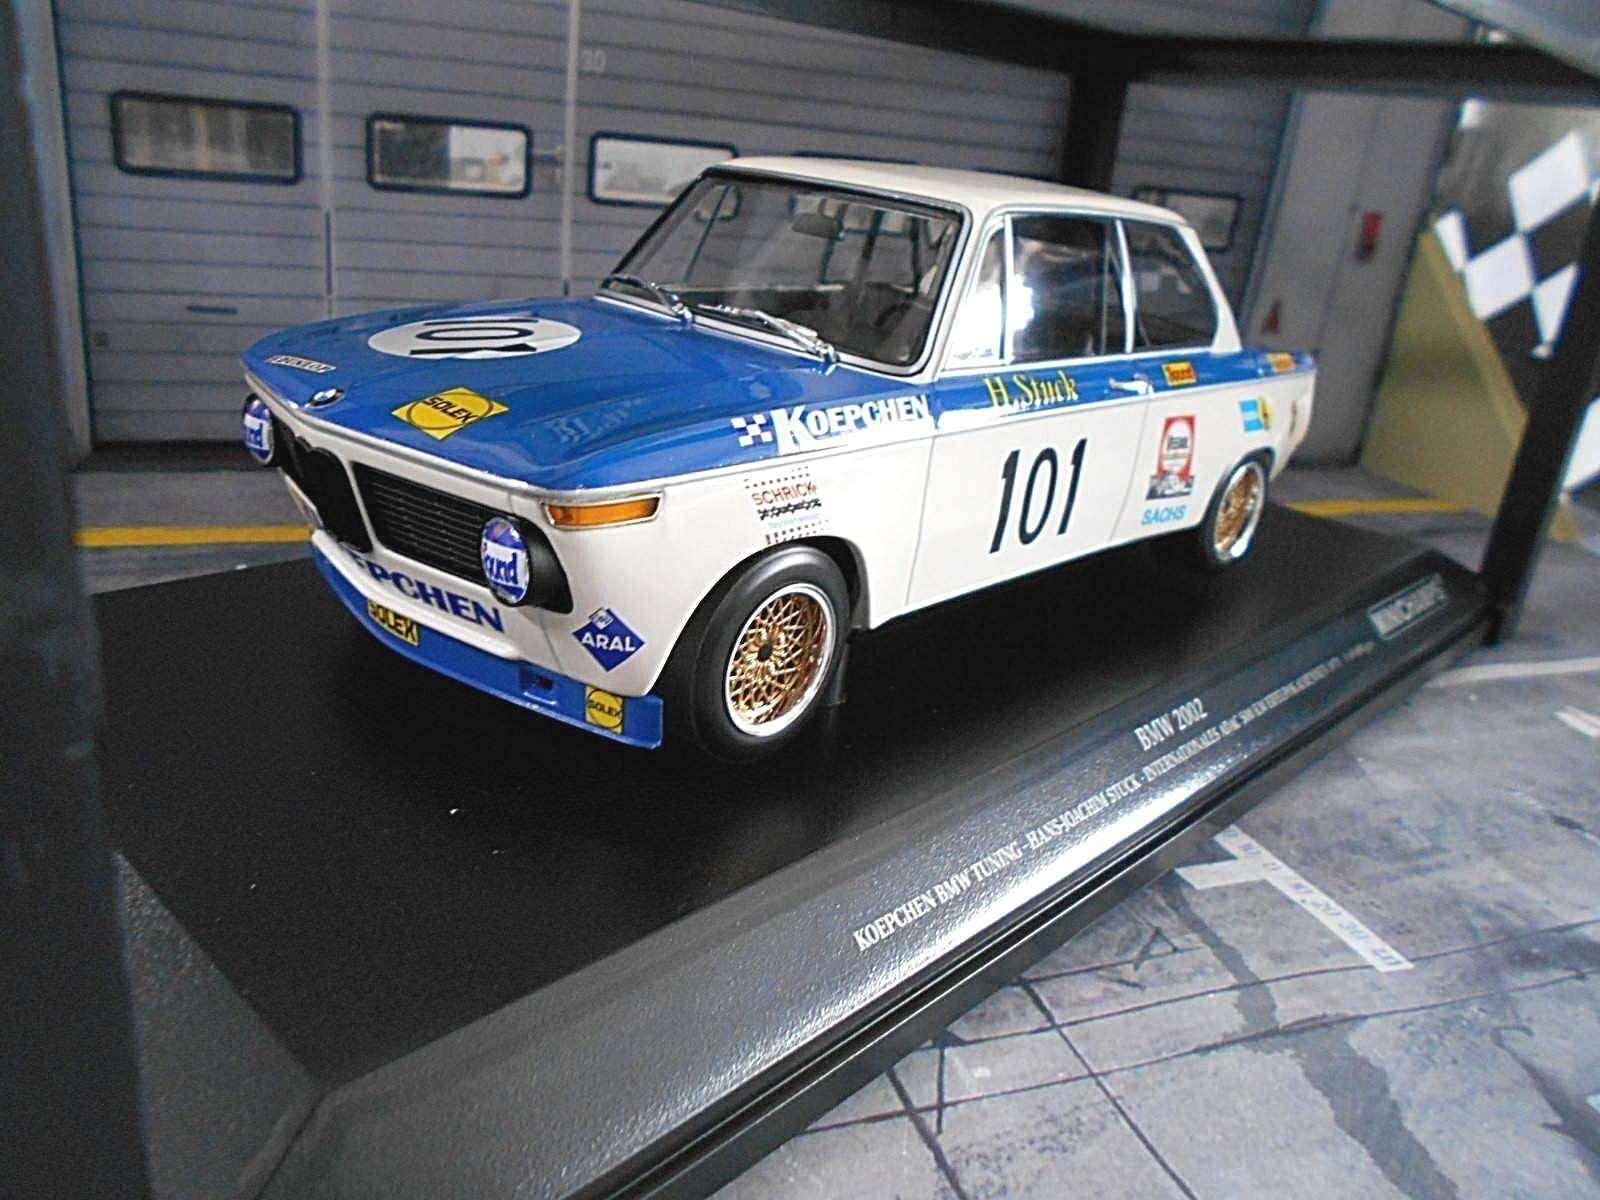 BMW 2002 2002 2002 DRM  101 stuc Koepchen Tuning Eifel course Winner 1971 Minichamps 1 18 213043